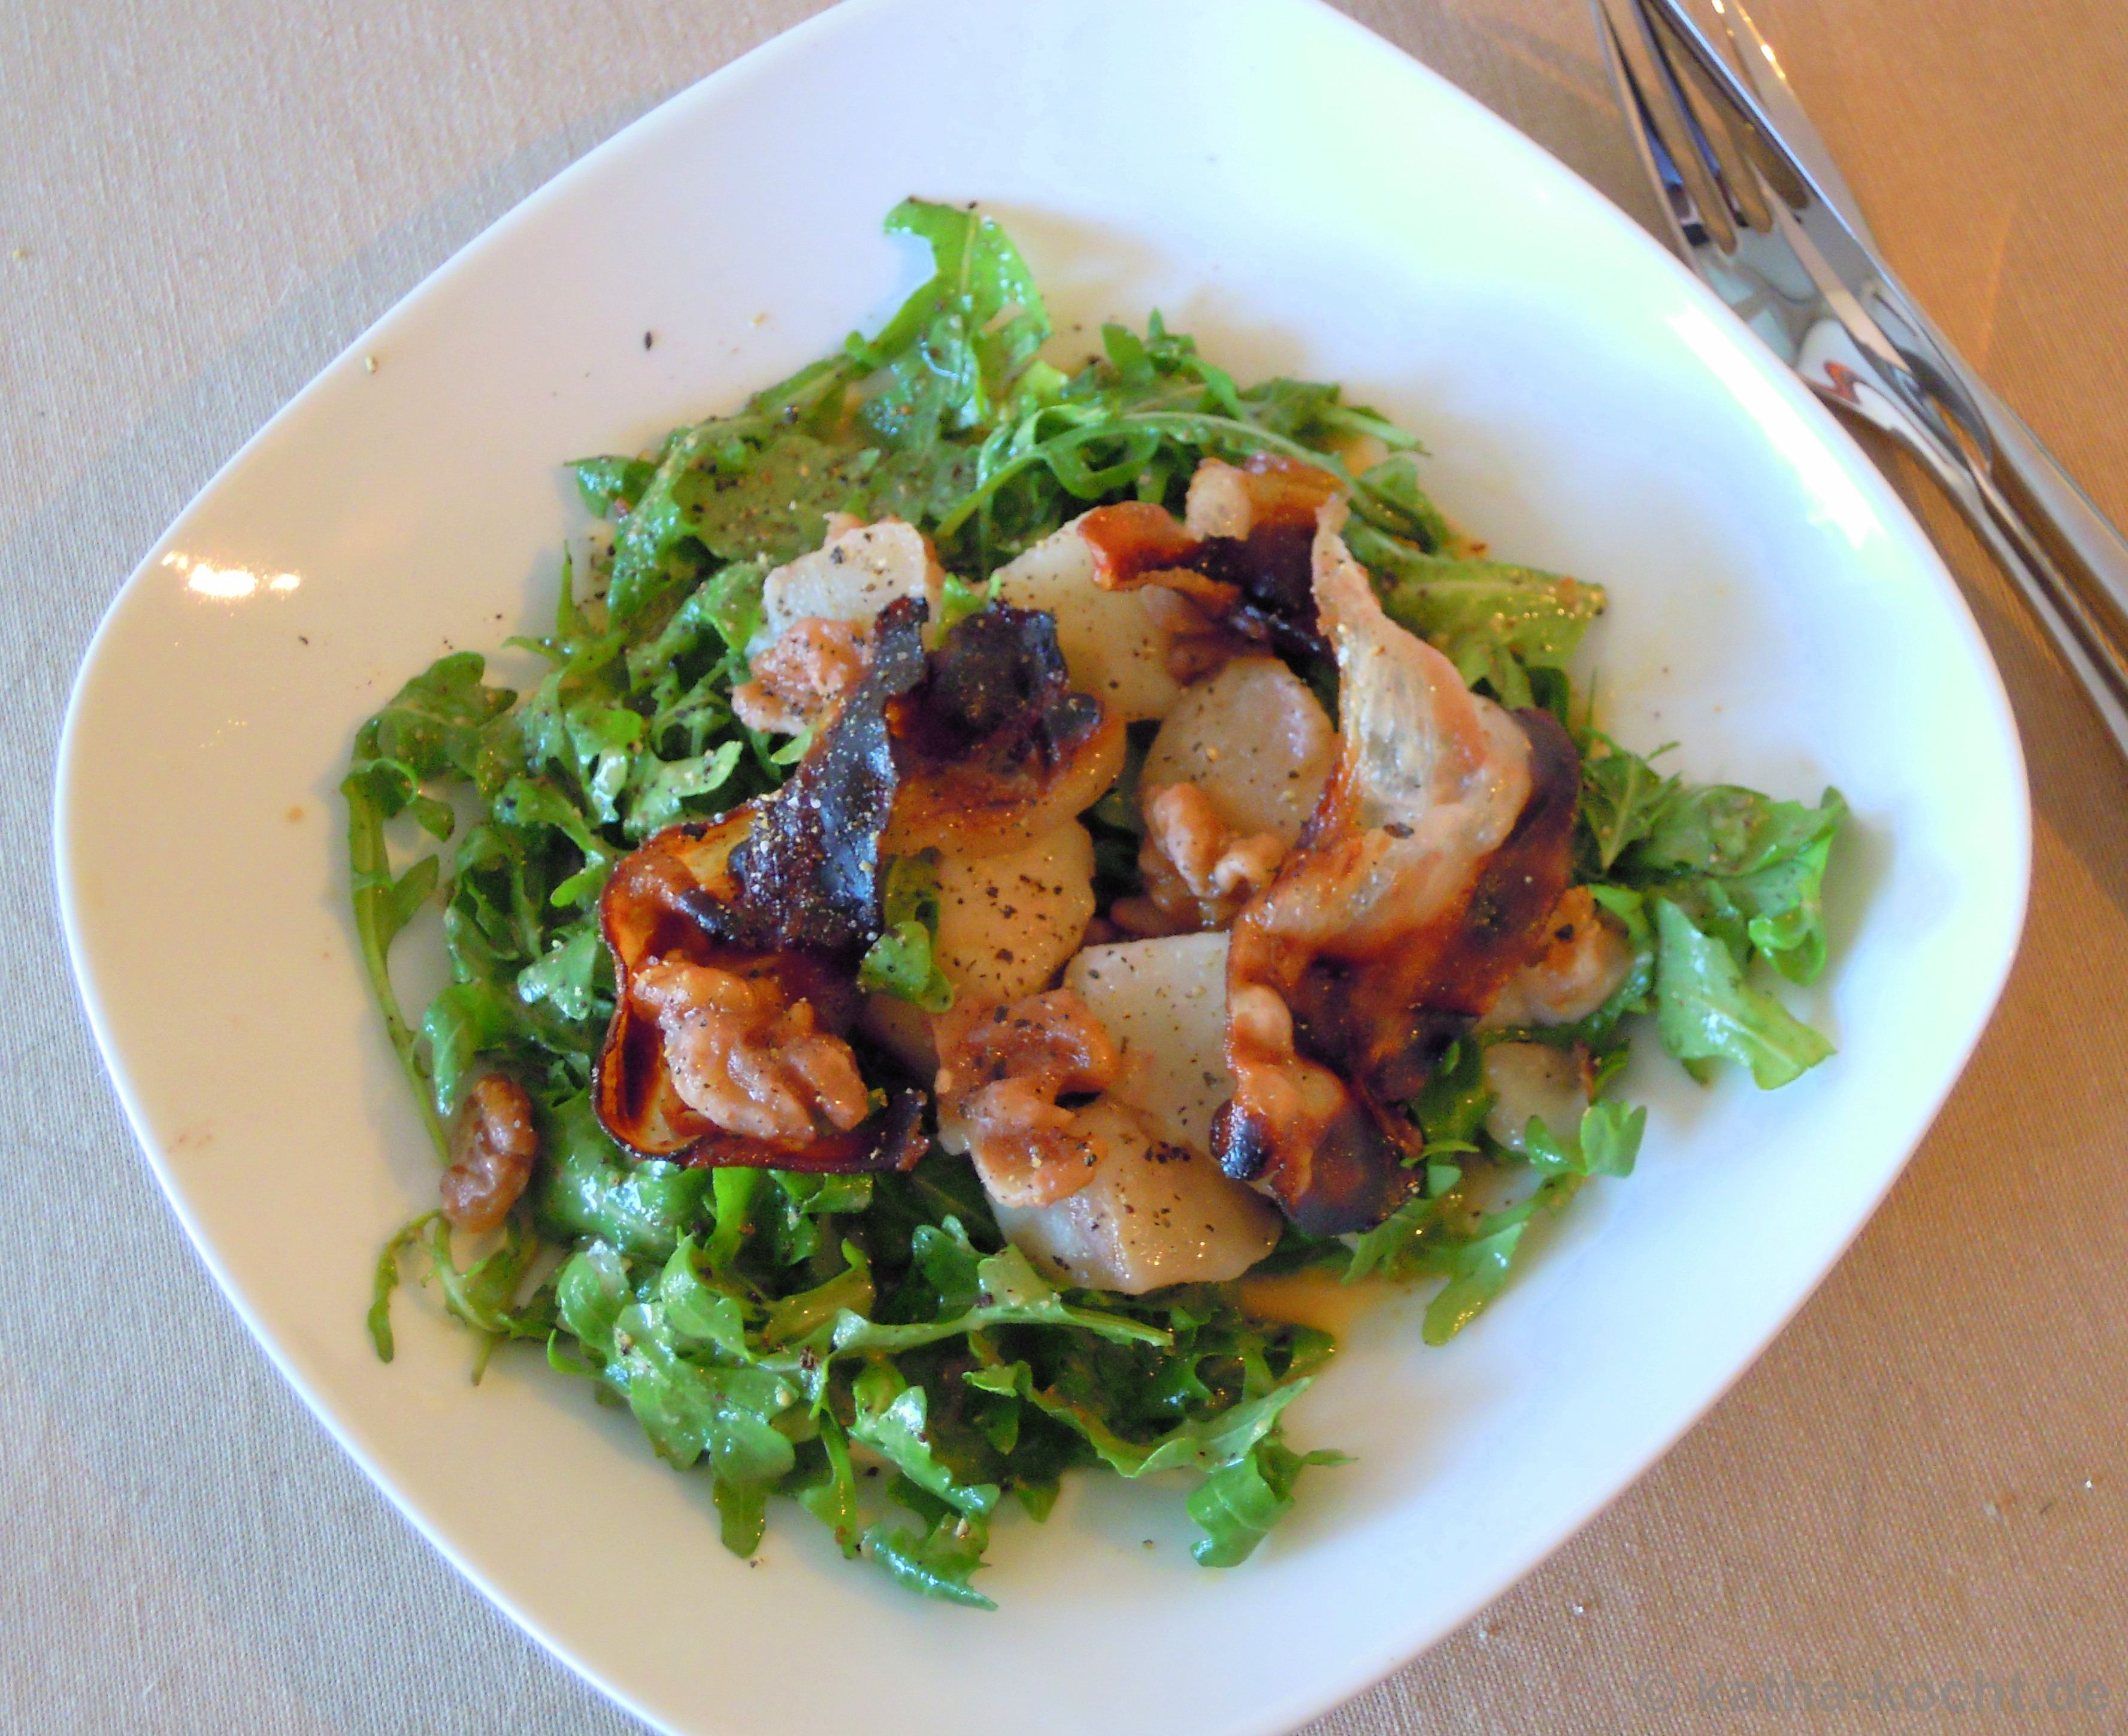 warmer birne pancetta salat mit senf dressing katha kocht. Black Bedroom Furniture Sets. Home Design Ideas